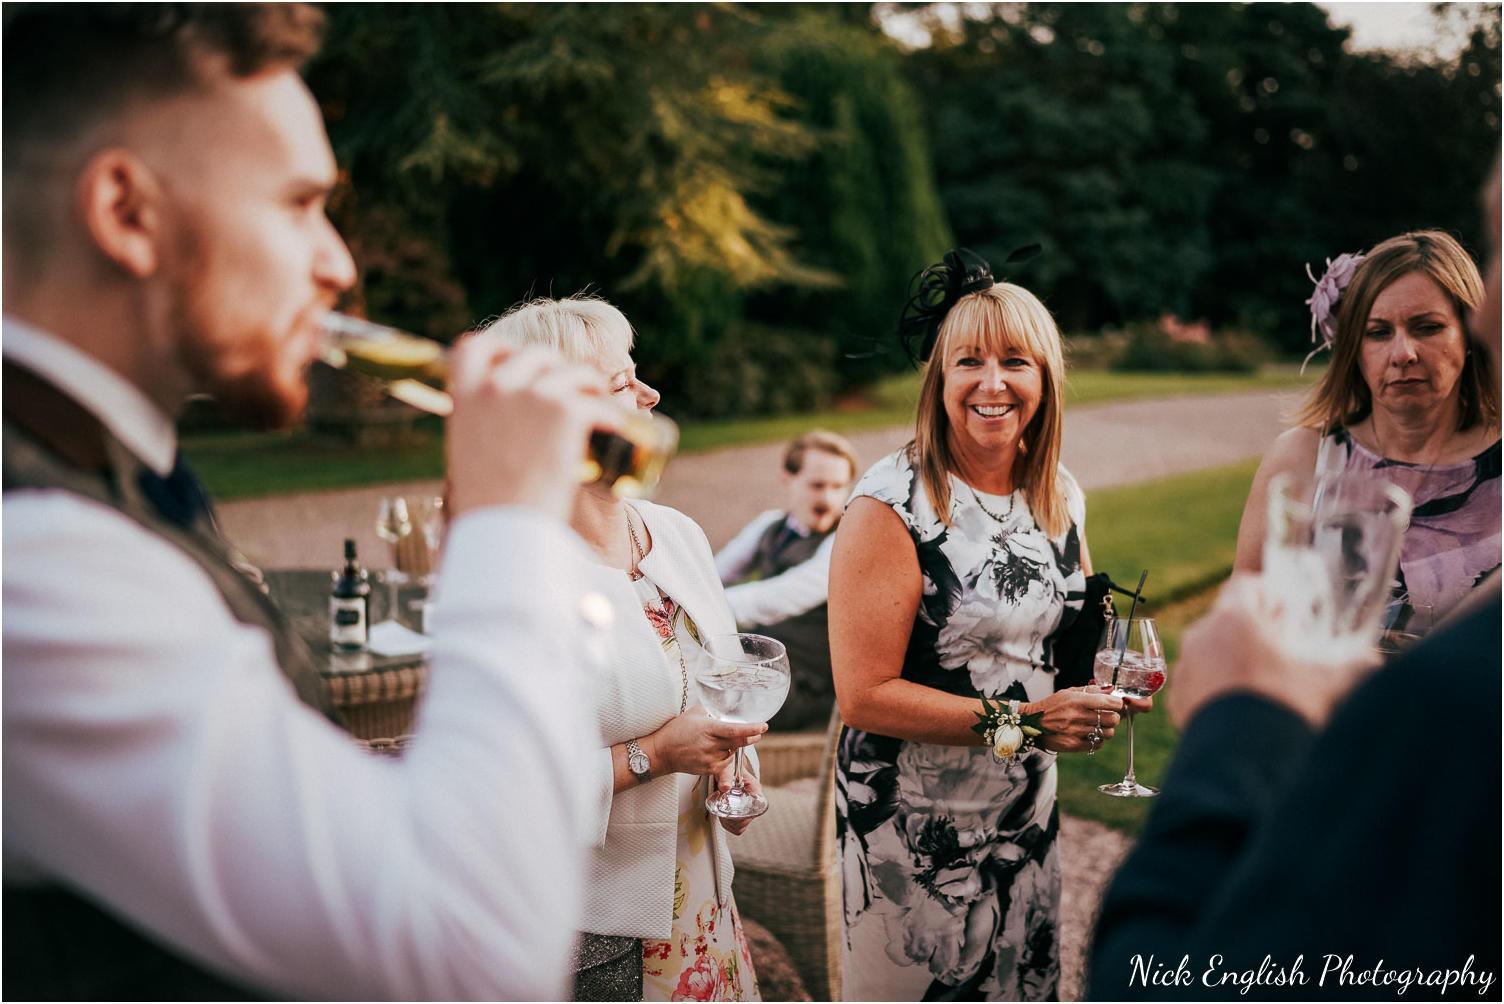 Eaves_Hall_Outdoor_Wedding_Photograph-86.jpg